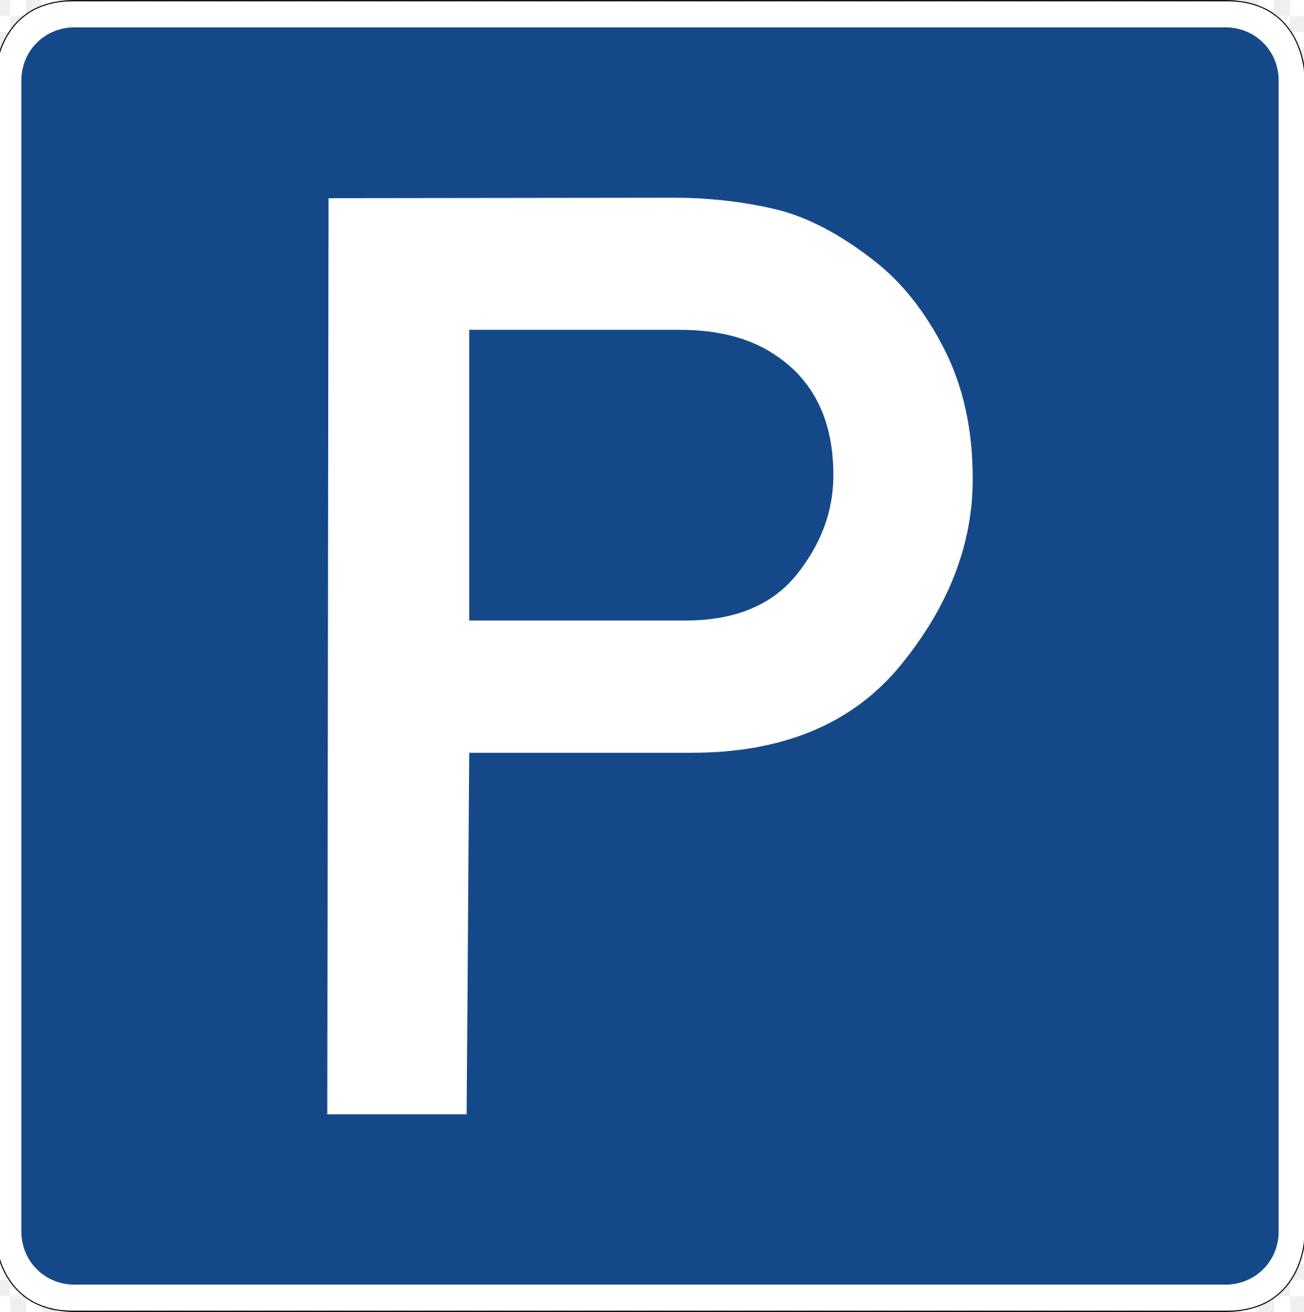 Wohnwagen Stellplätze, Campingplätze, Parkplätze